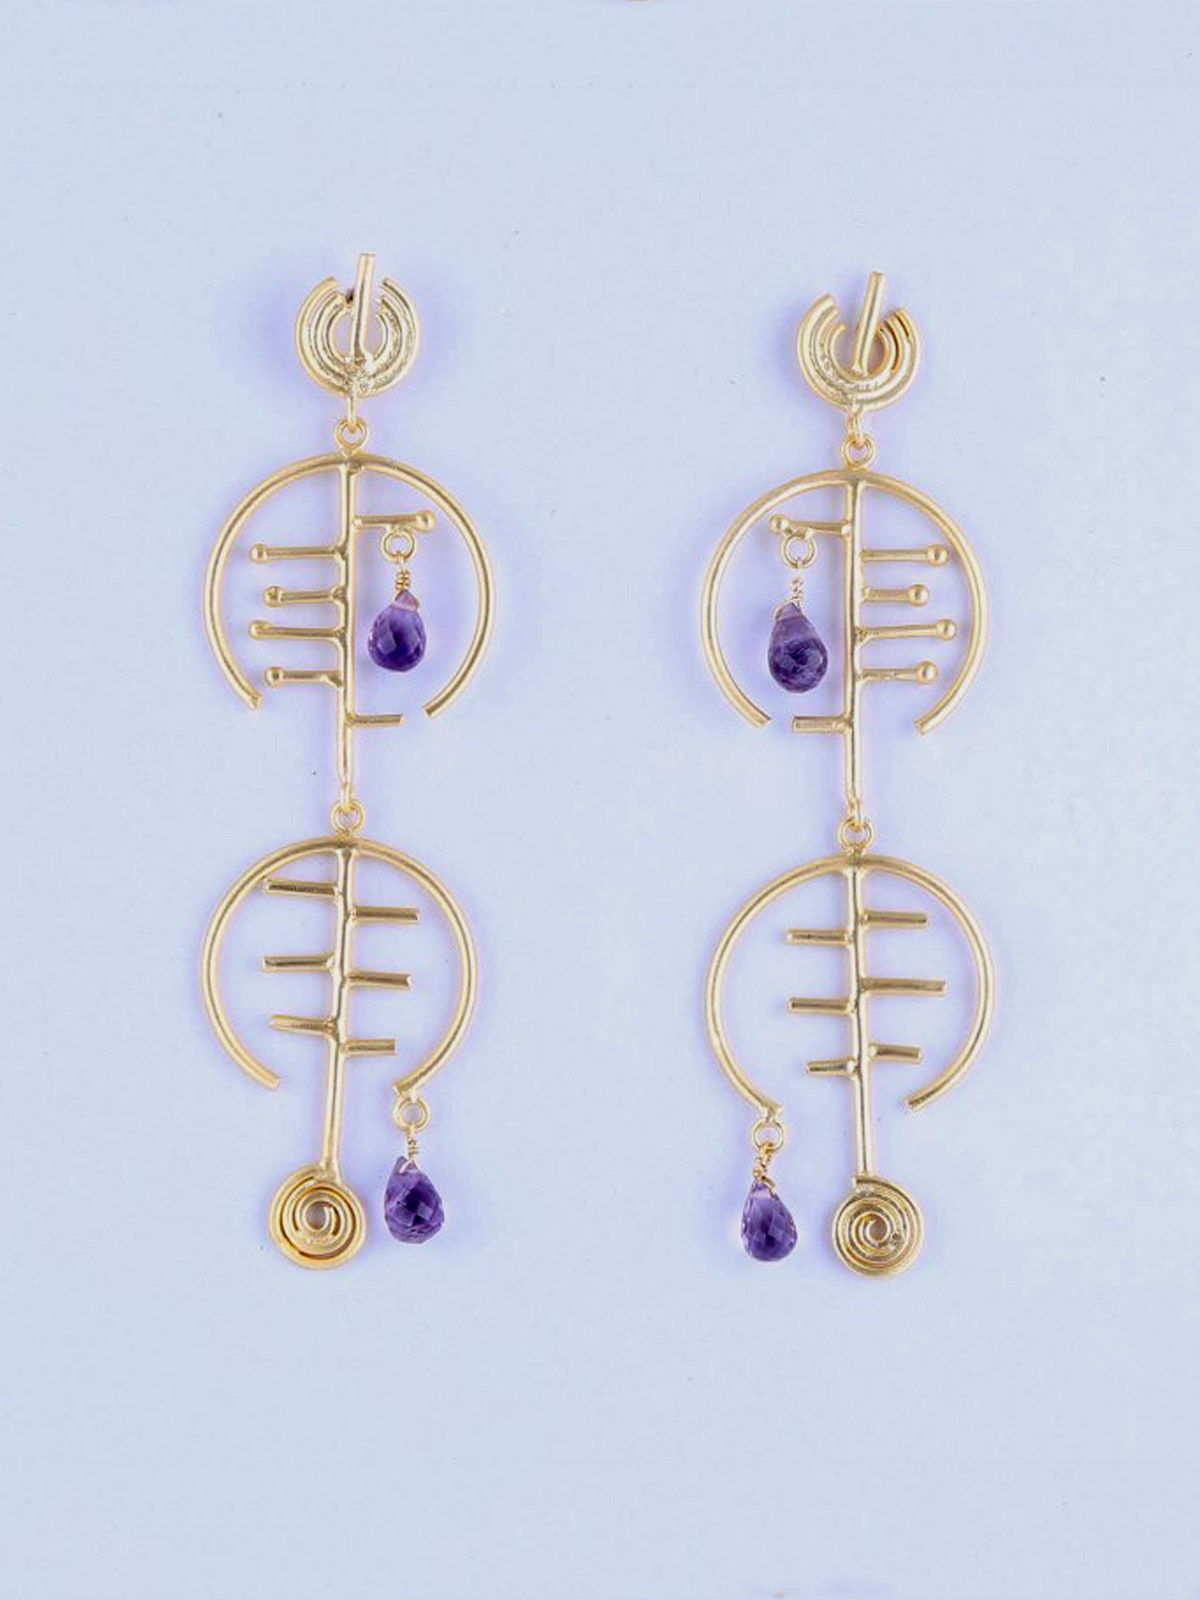 Lucifor semi precious metal earrings